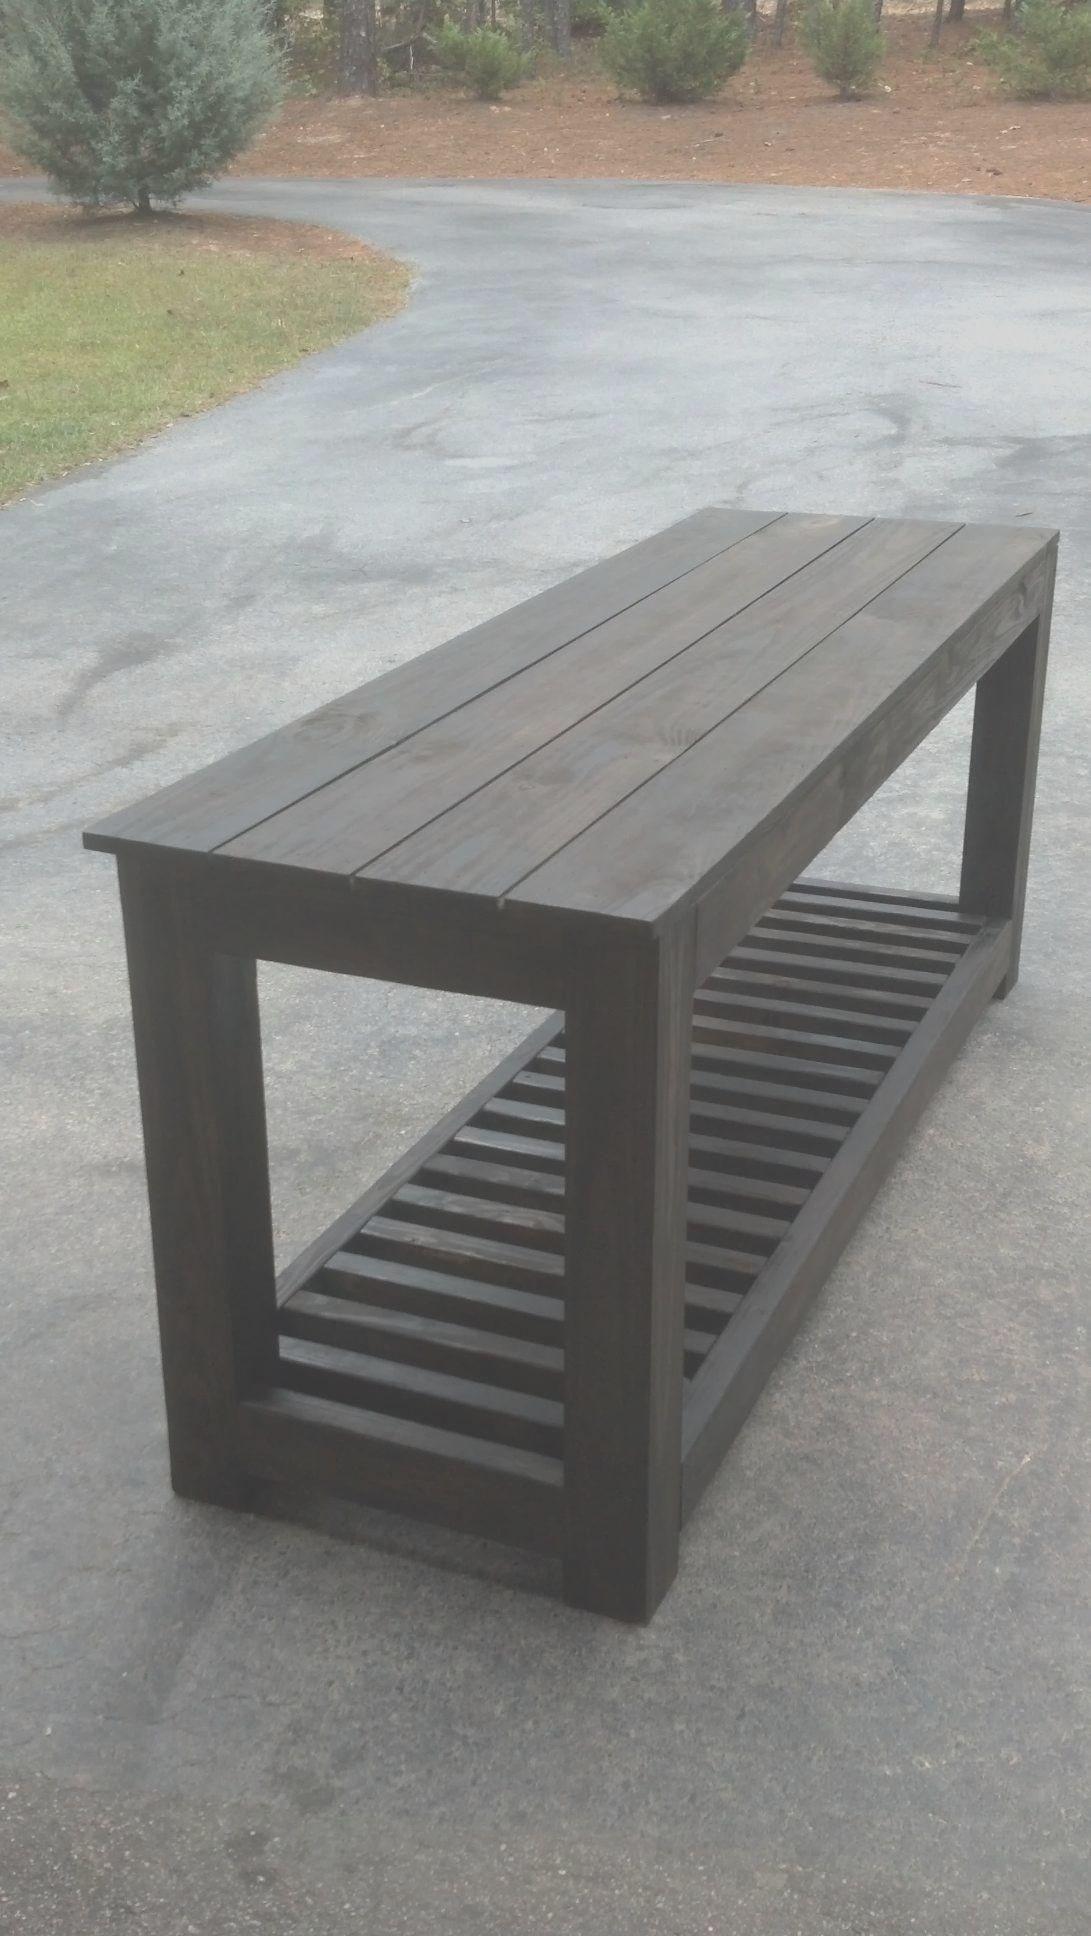 Custom Built Kitchen Island Outdoor Prep Table In 2020 Outdoor Kitchen Island Outdoor Outdoor Kitchen